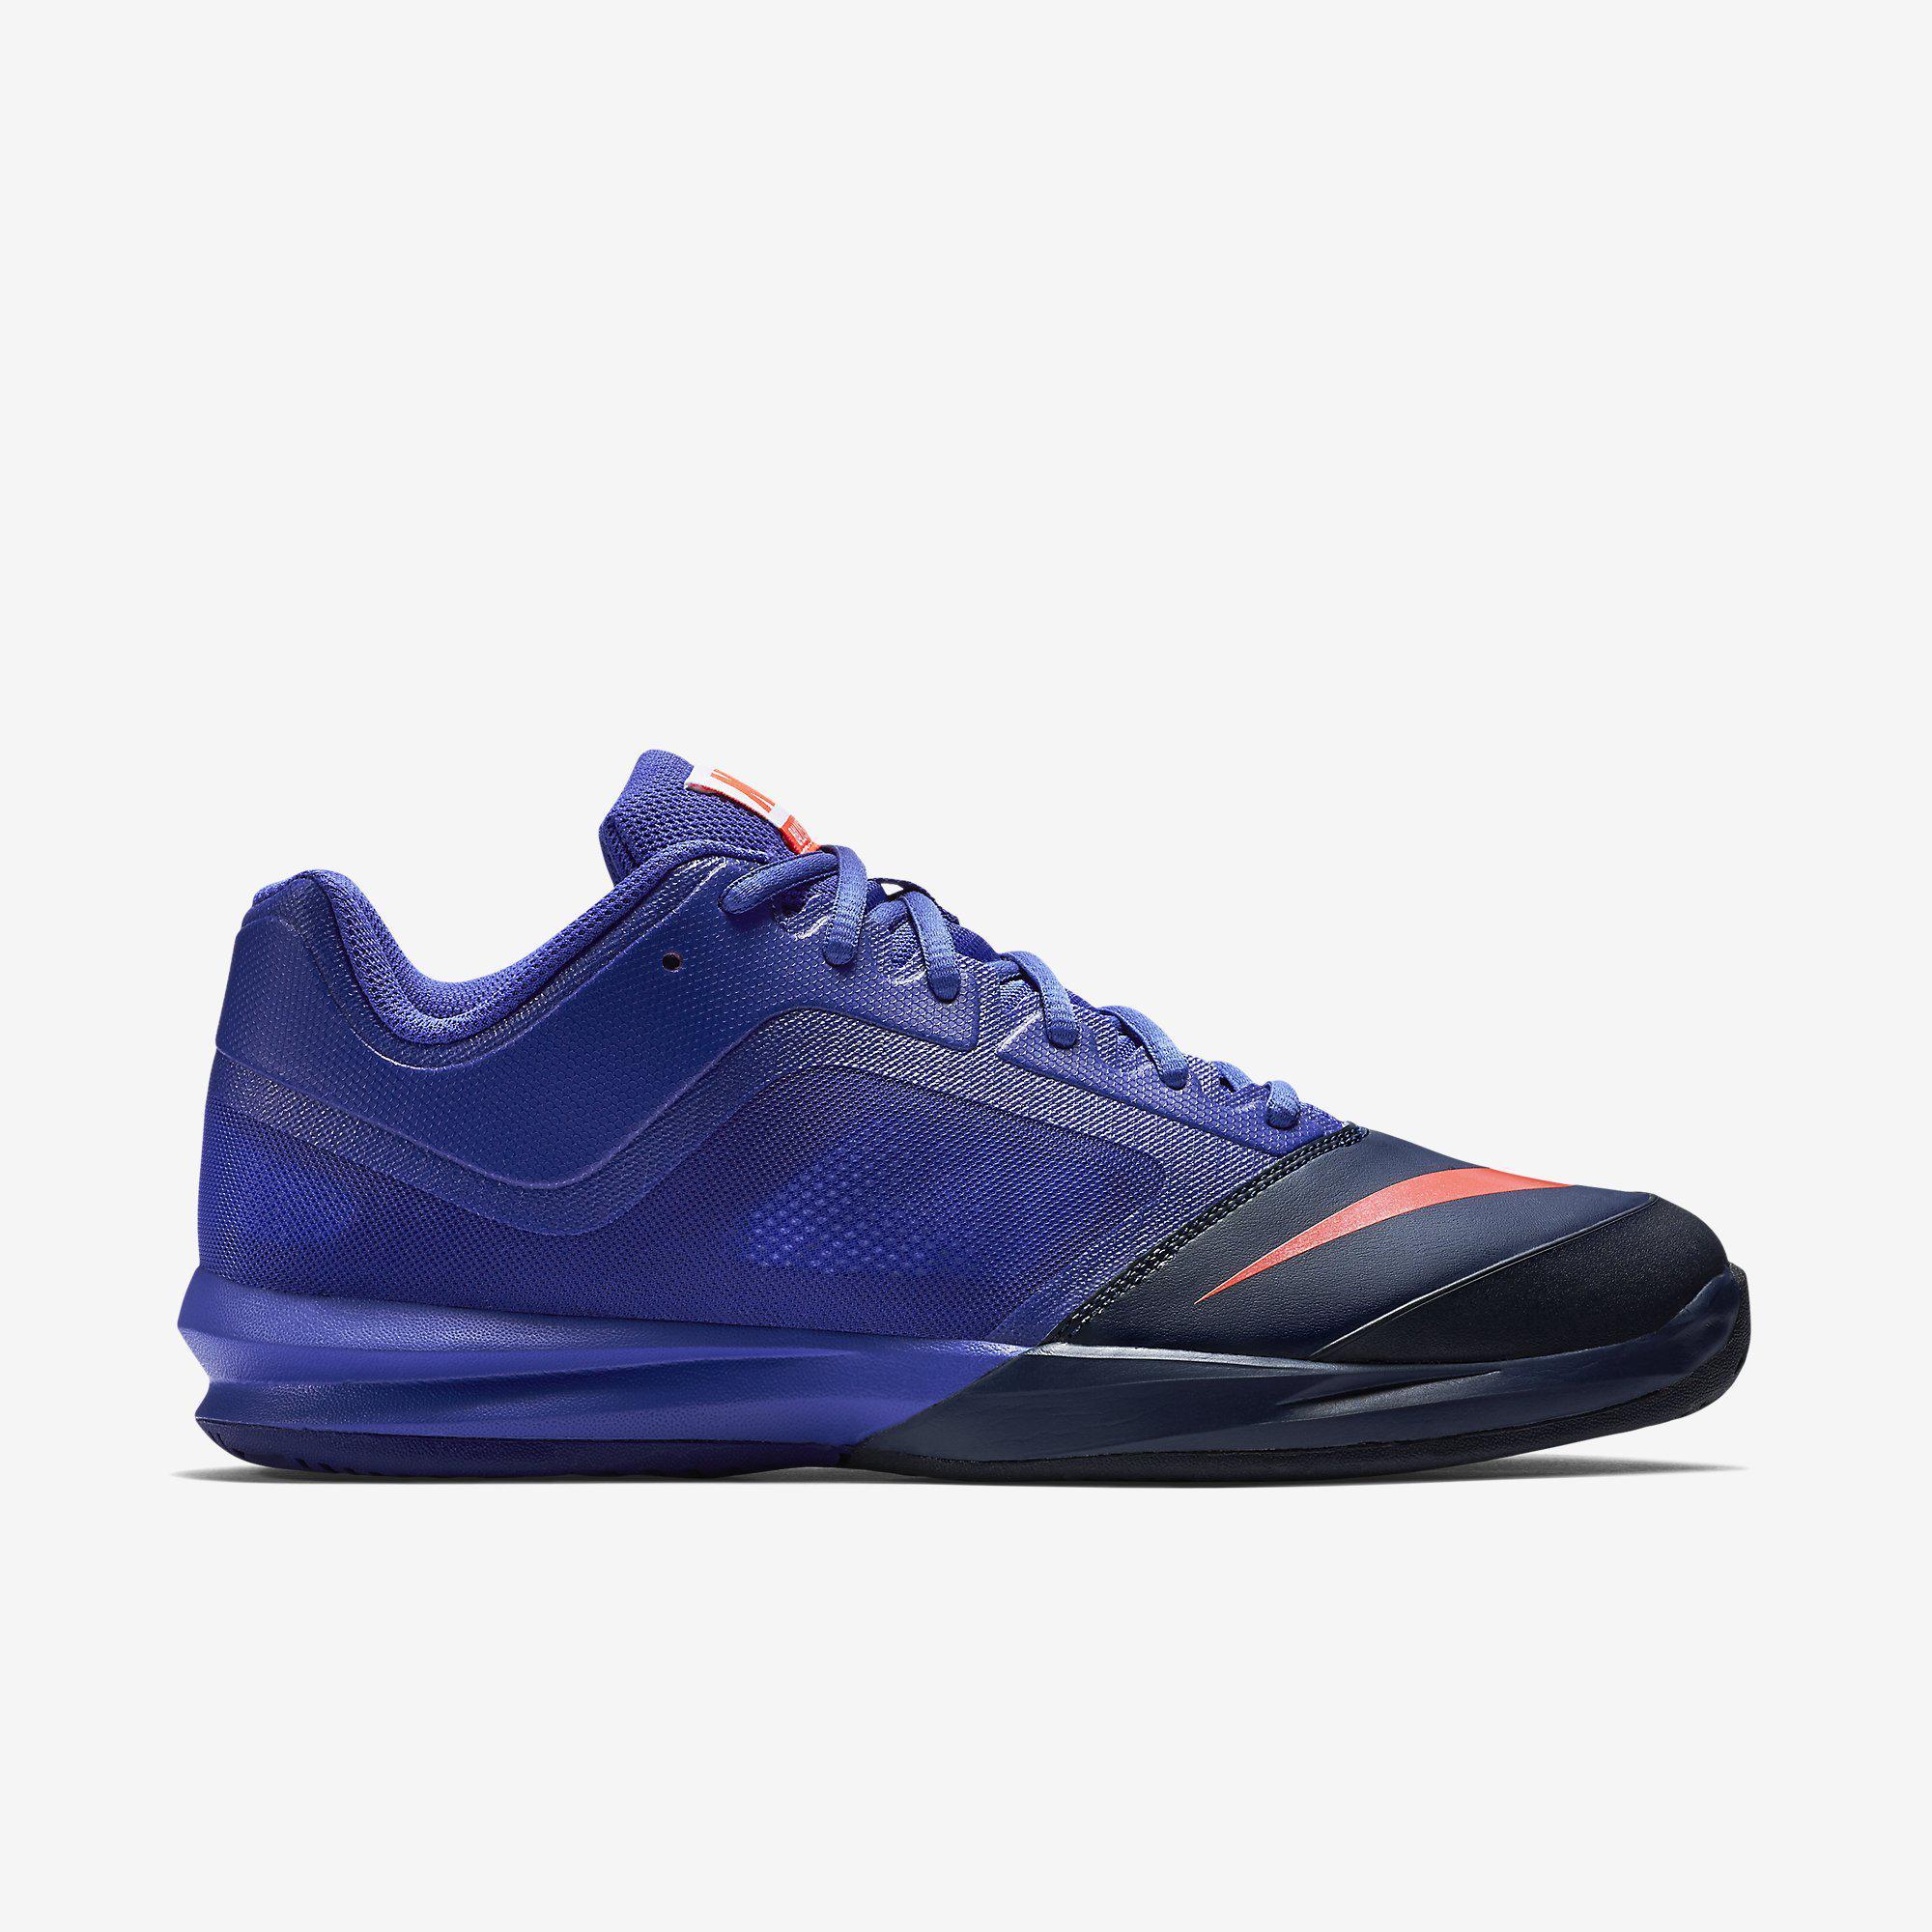 05929cfb8b1118 Nike Mens Dual Fusion Ballistec Advantage Tennis Shoes - Persian Violet Midnight  Navy - Tennisnuts.com